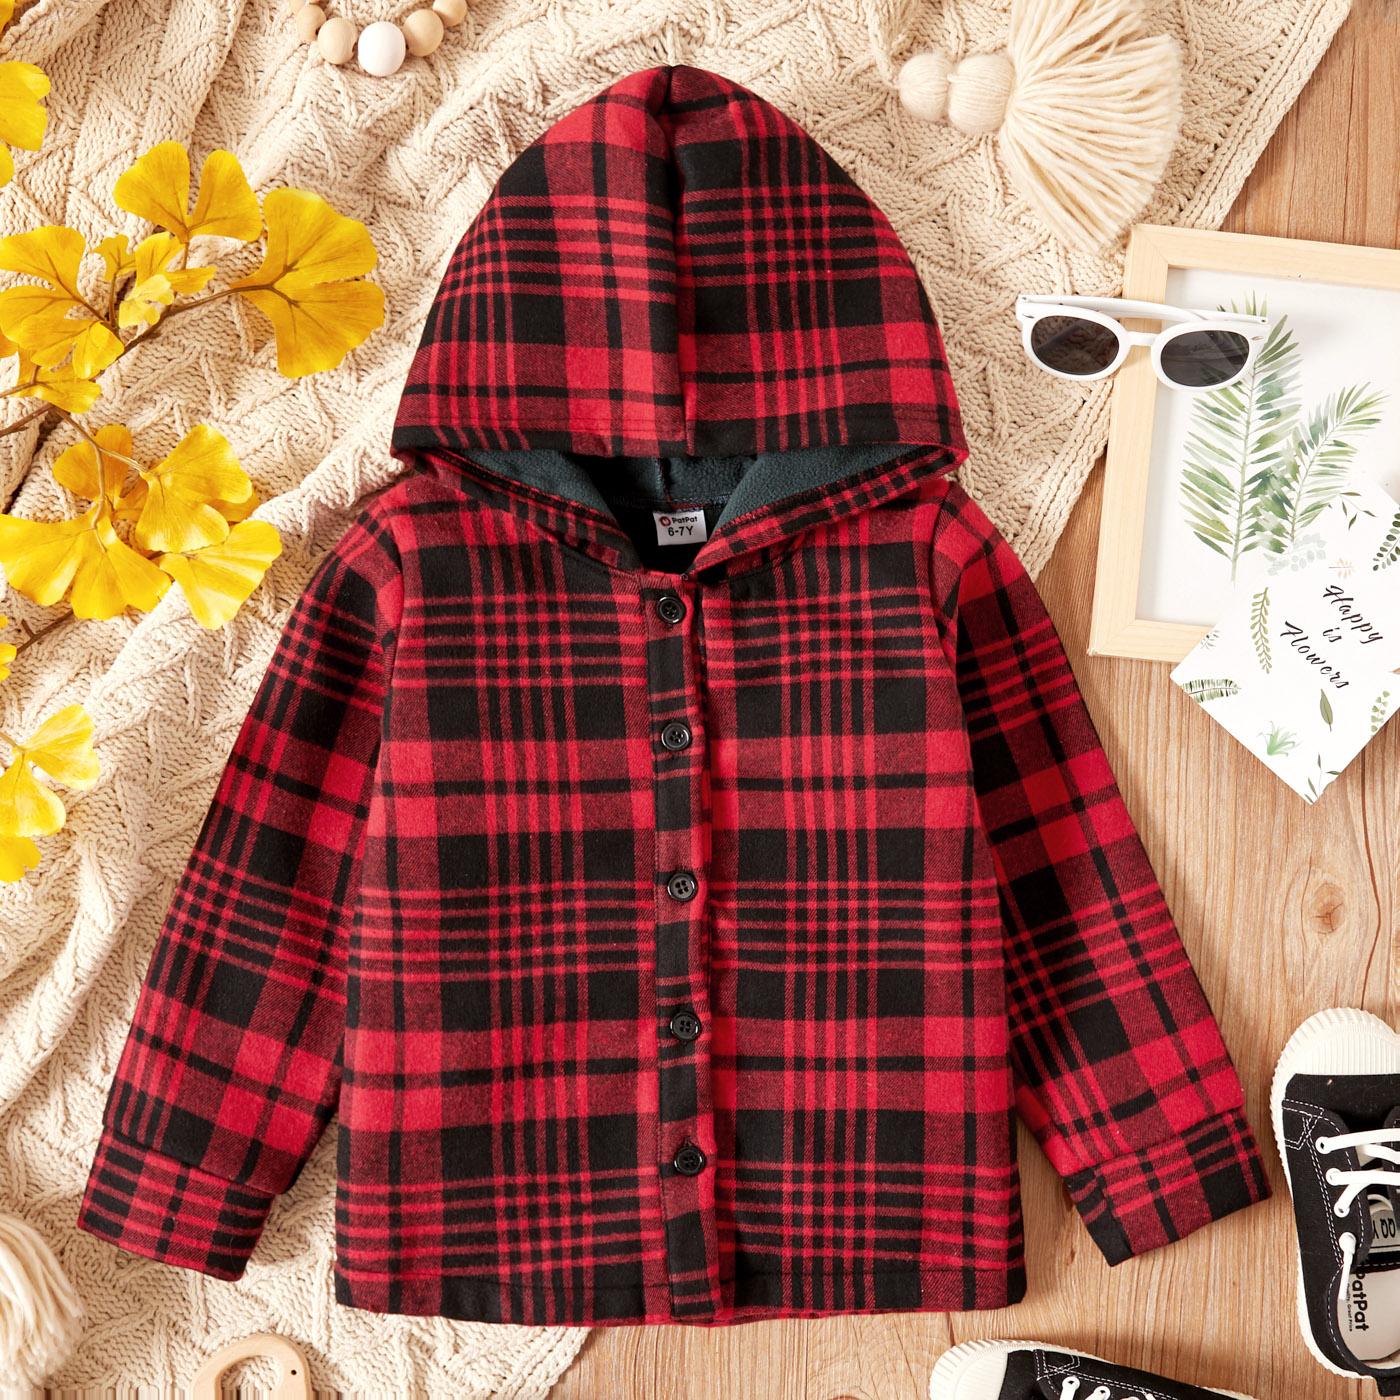 Kid Boy/Kid Girl Plaid Button Design Fleece Lined Hooded Shirt